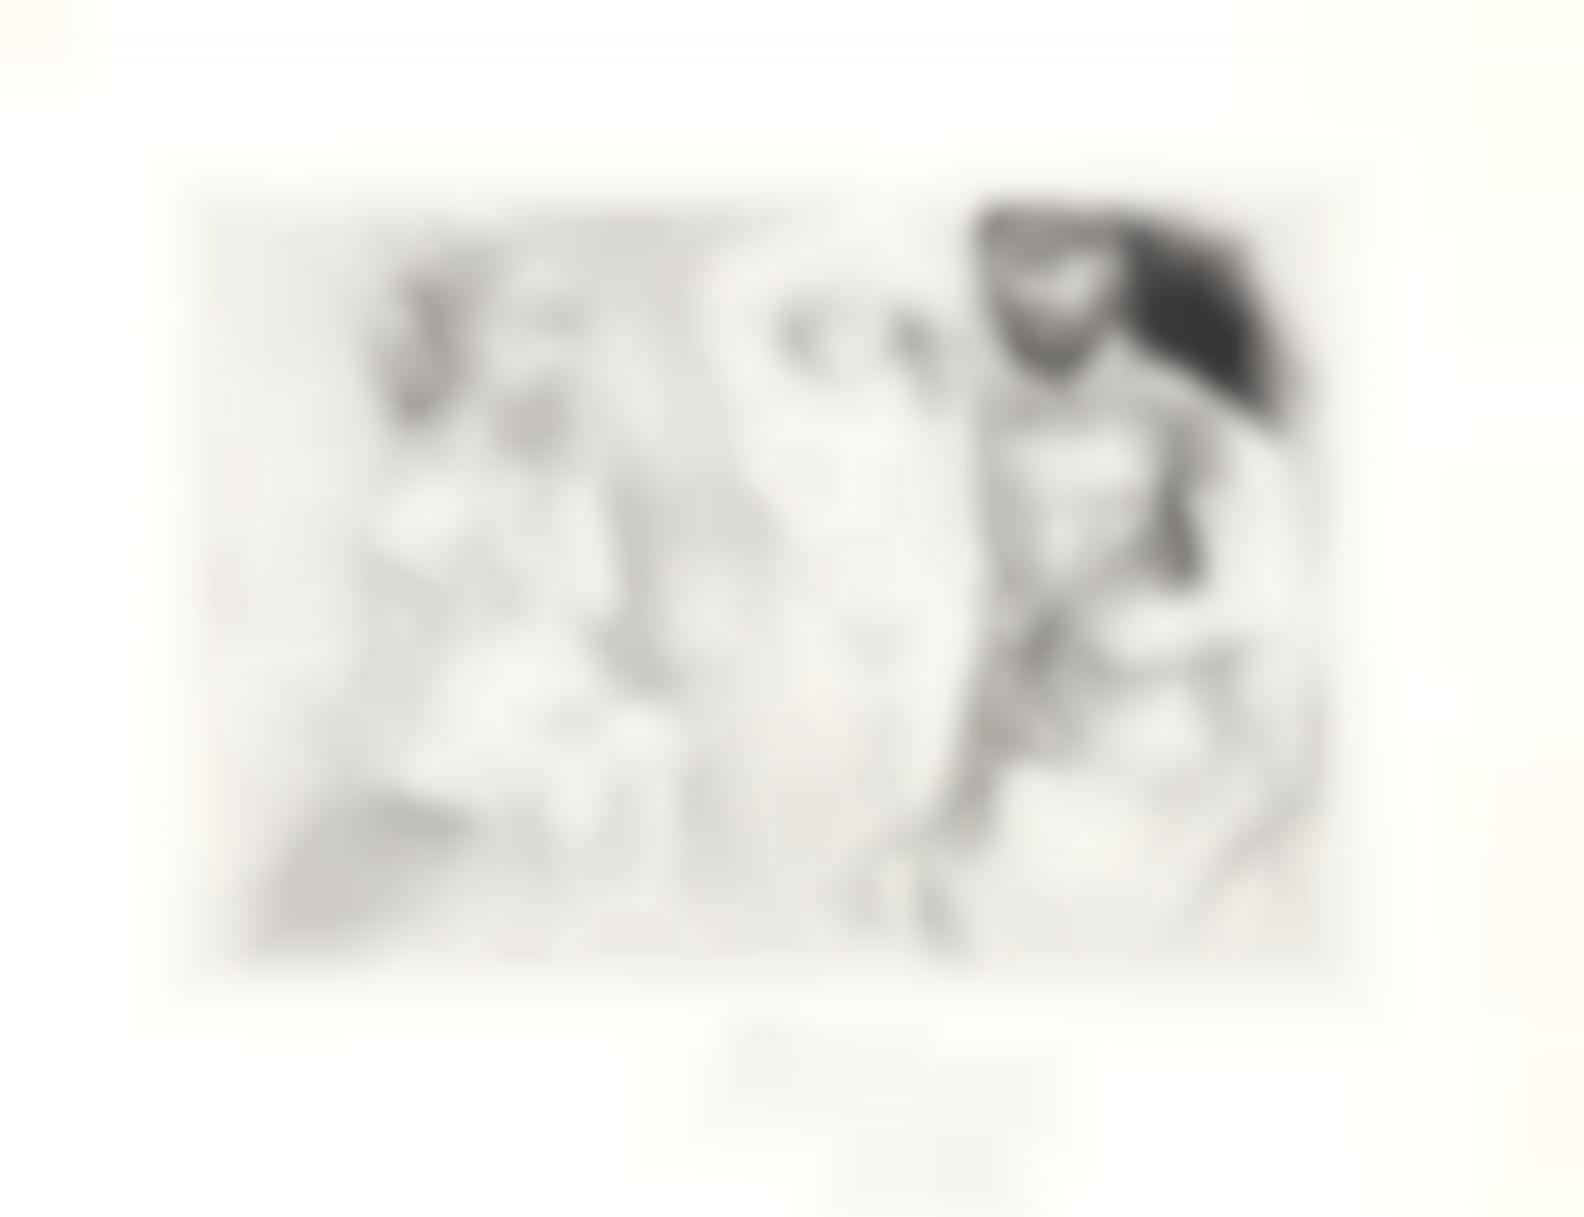 Pablo Picasso-Deux Hommes Barbus Avec Une Femme Nue, From El Entierro Del Conde Orgaz(Bloch 1467; Baer 1378)-1966